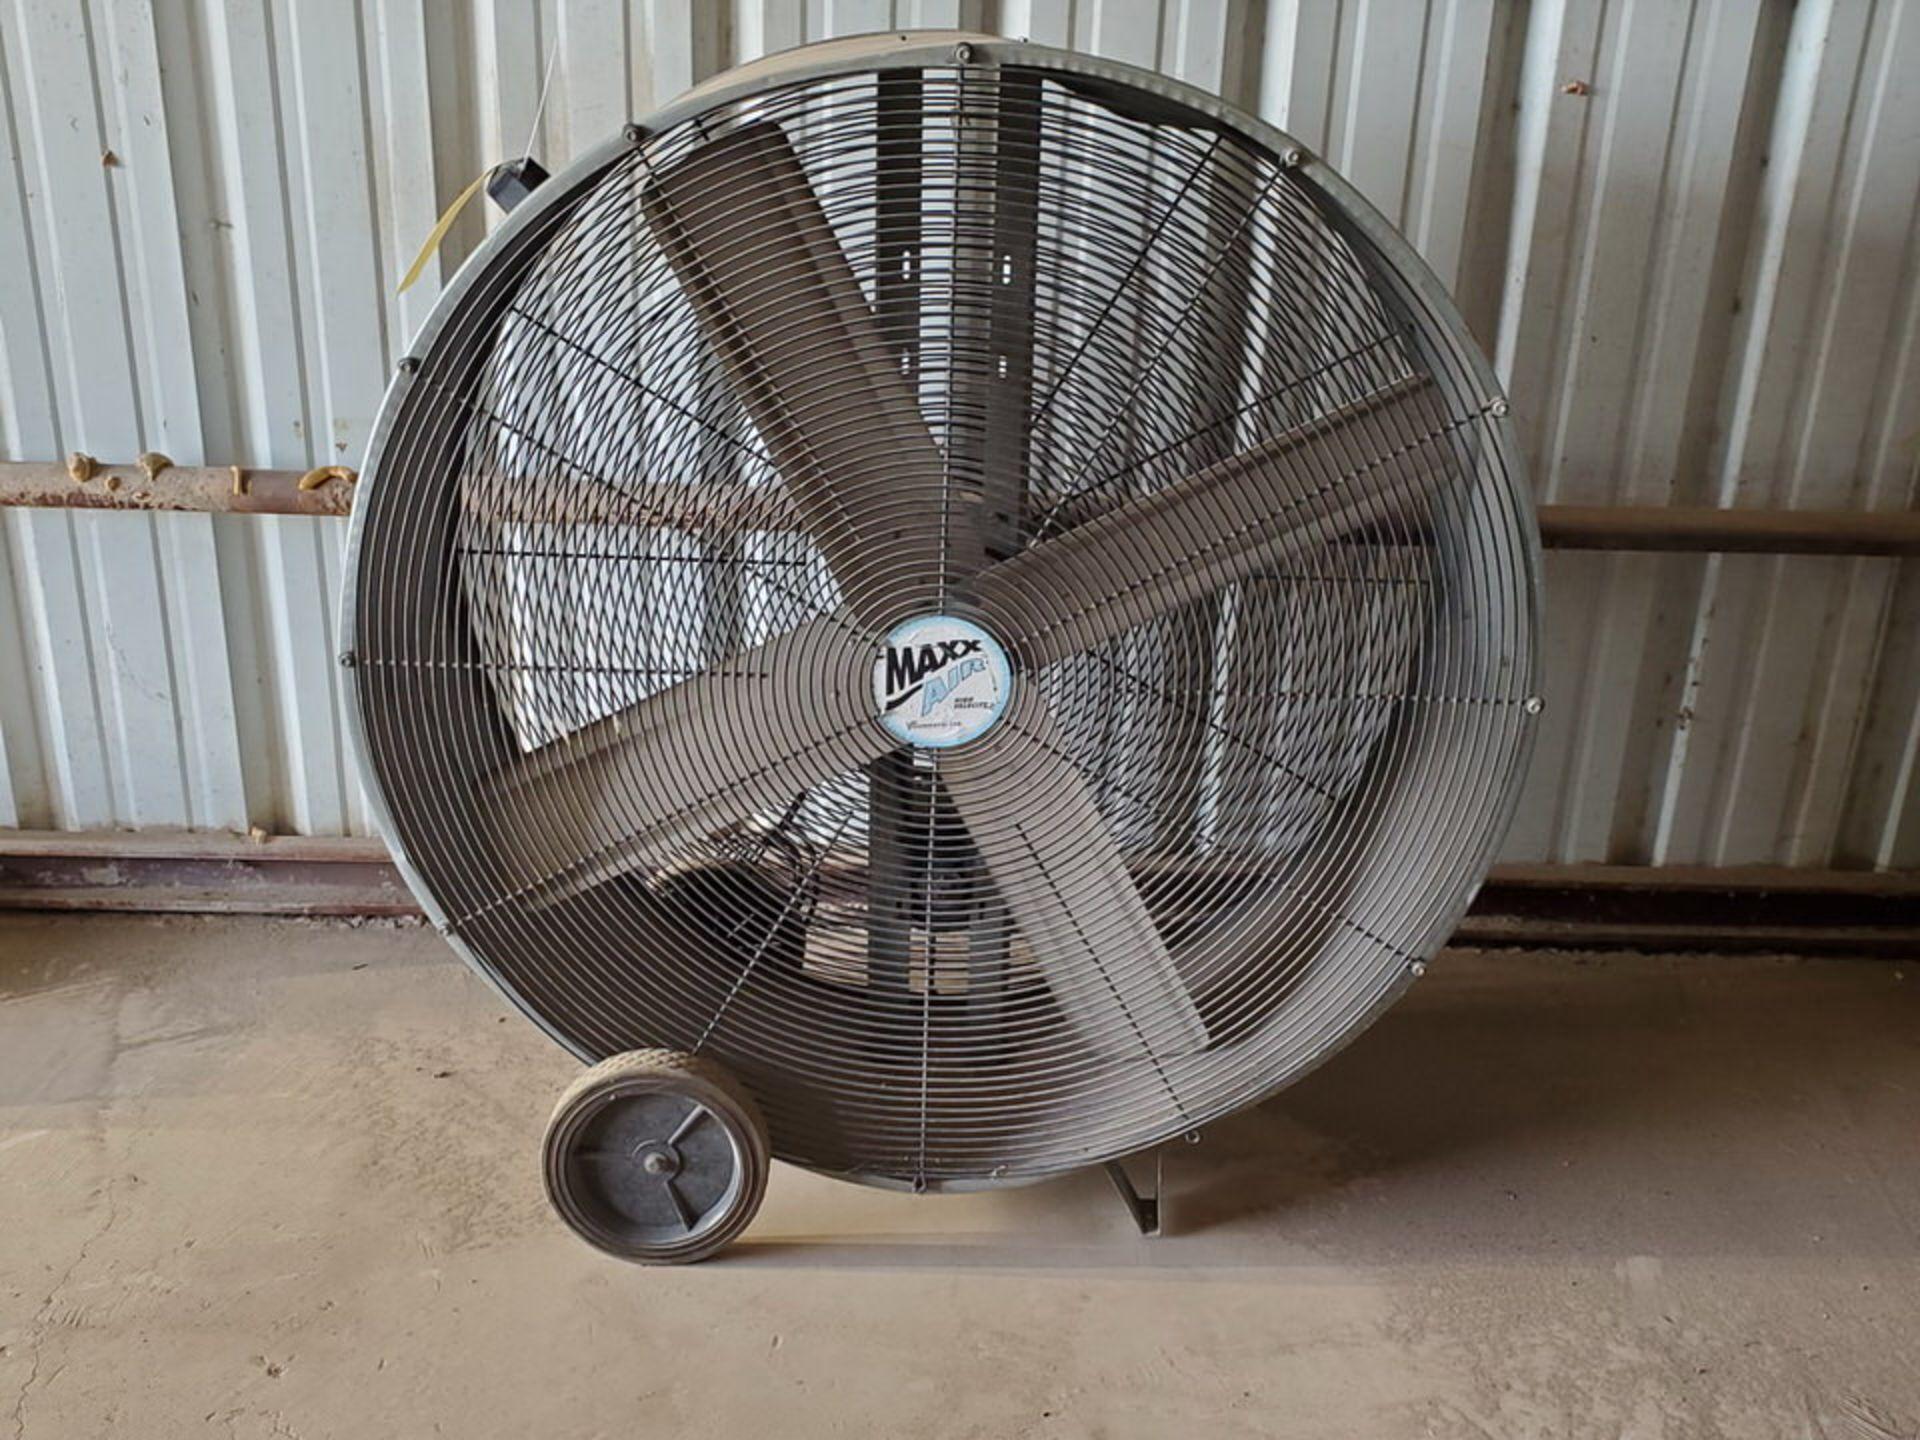 "Maxx 42"" Portable Air Drum Fan - Image 2 of 4"